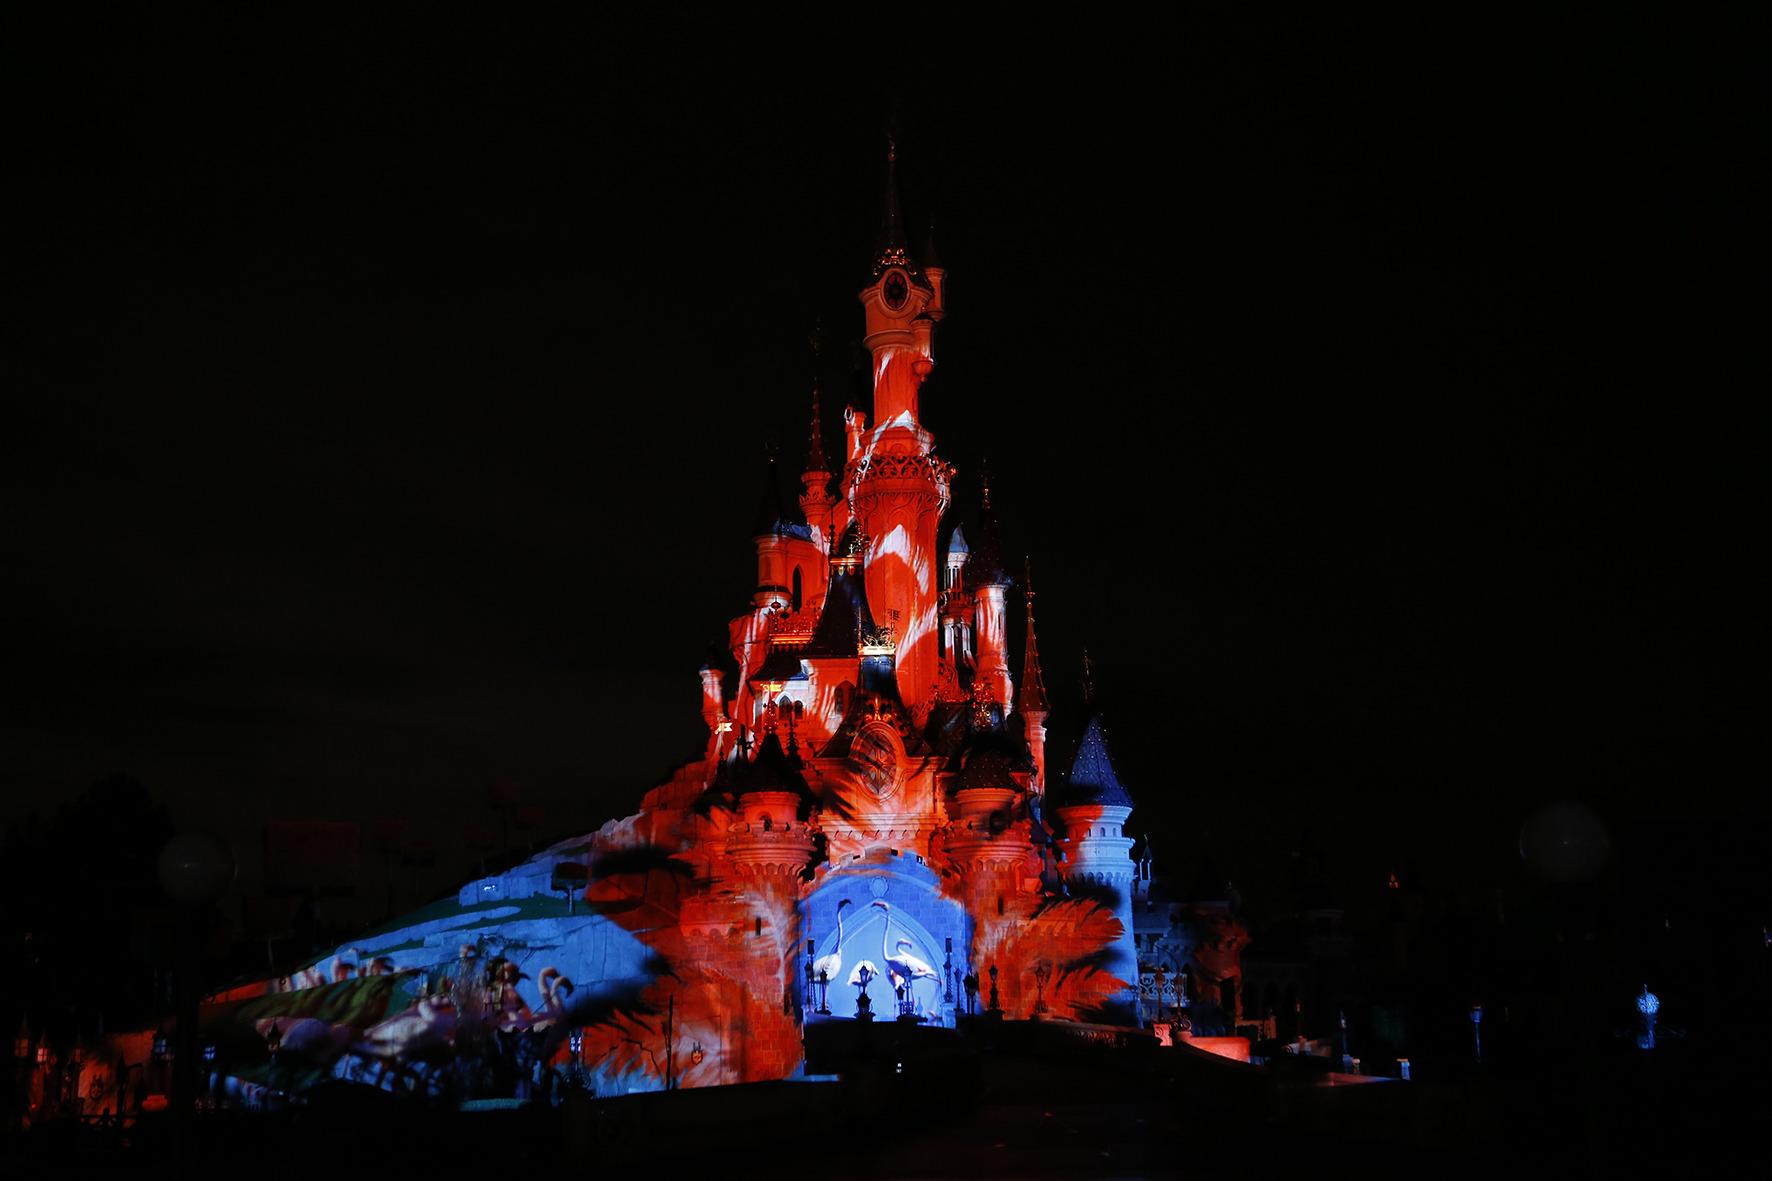 2019 - Disneynature Dn00210